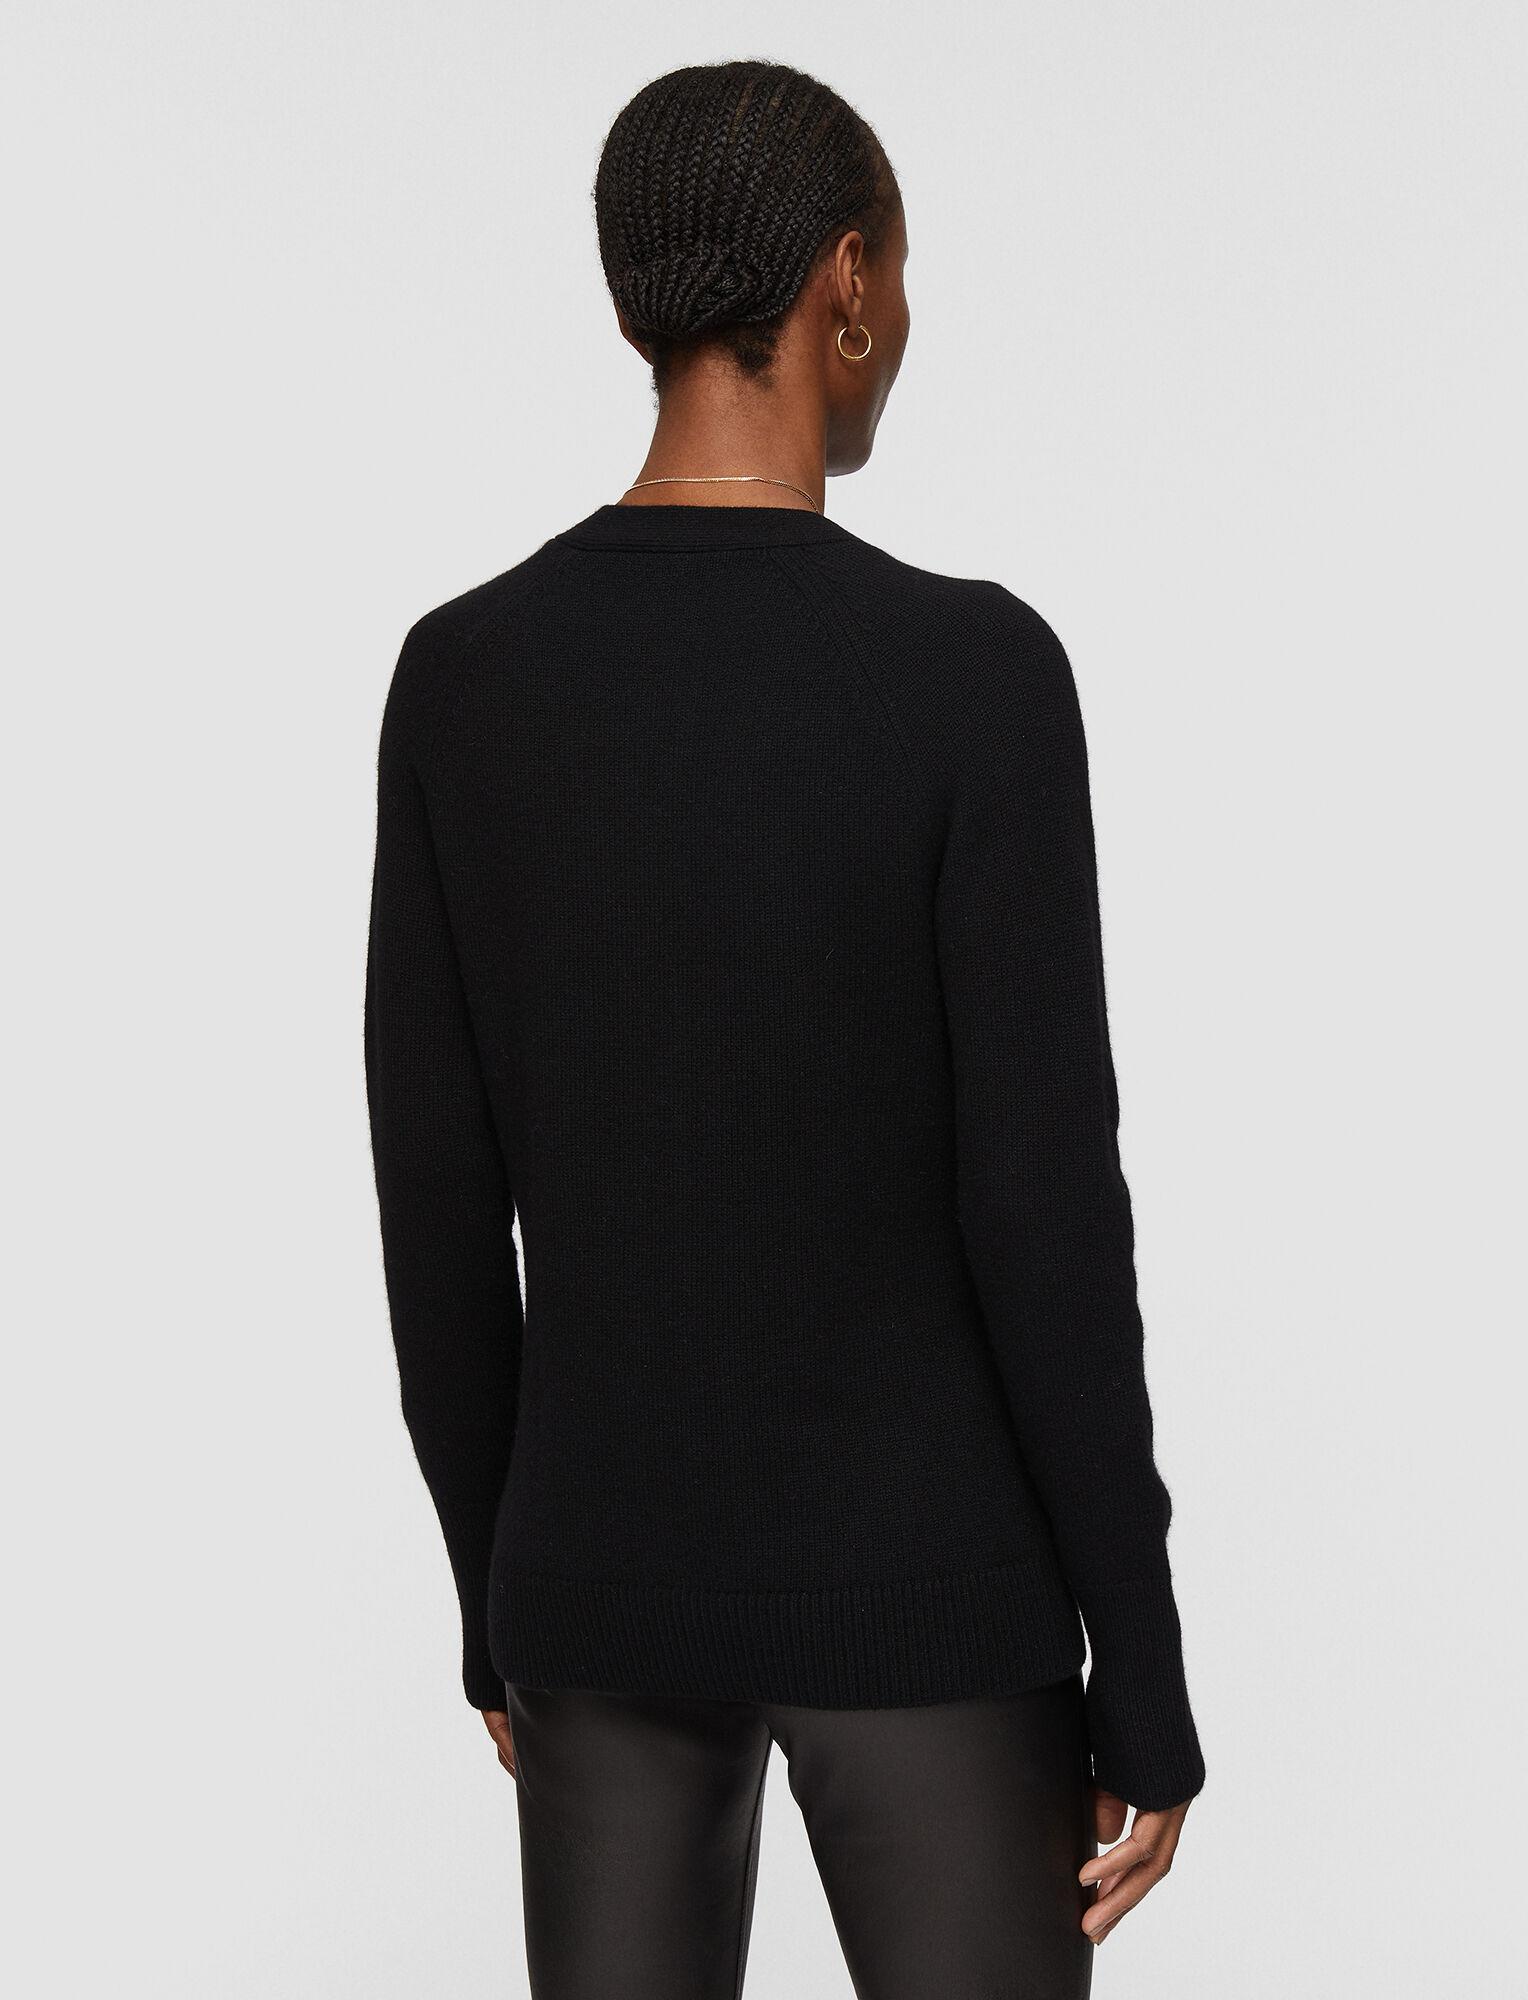 Joseph, Pure Cashmere Knit Cardigan, in Black